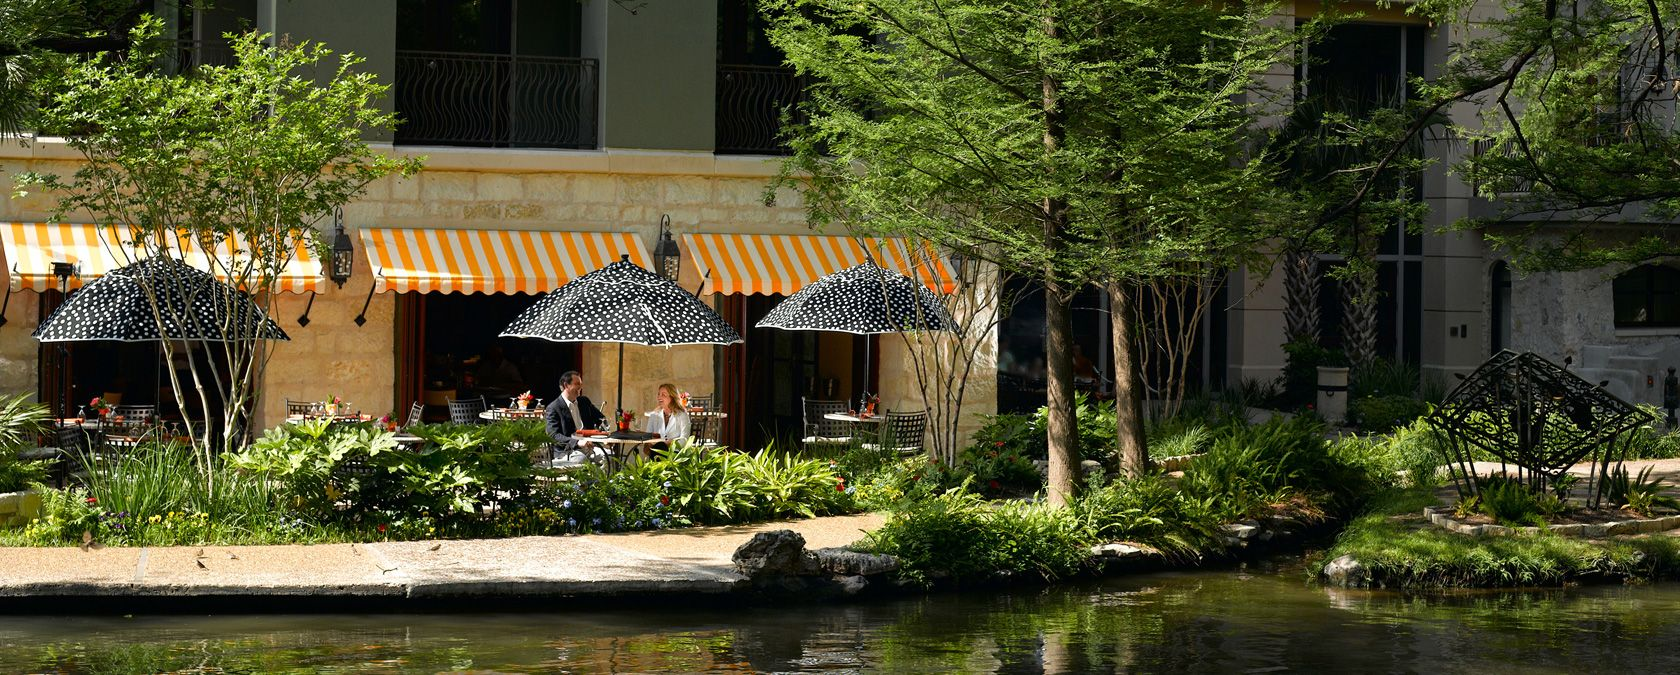 san antonio hotels hotel contessa san antonio riverwalk one of my